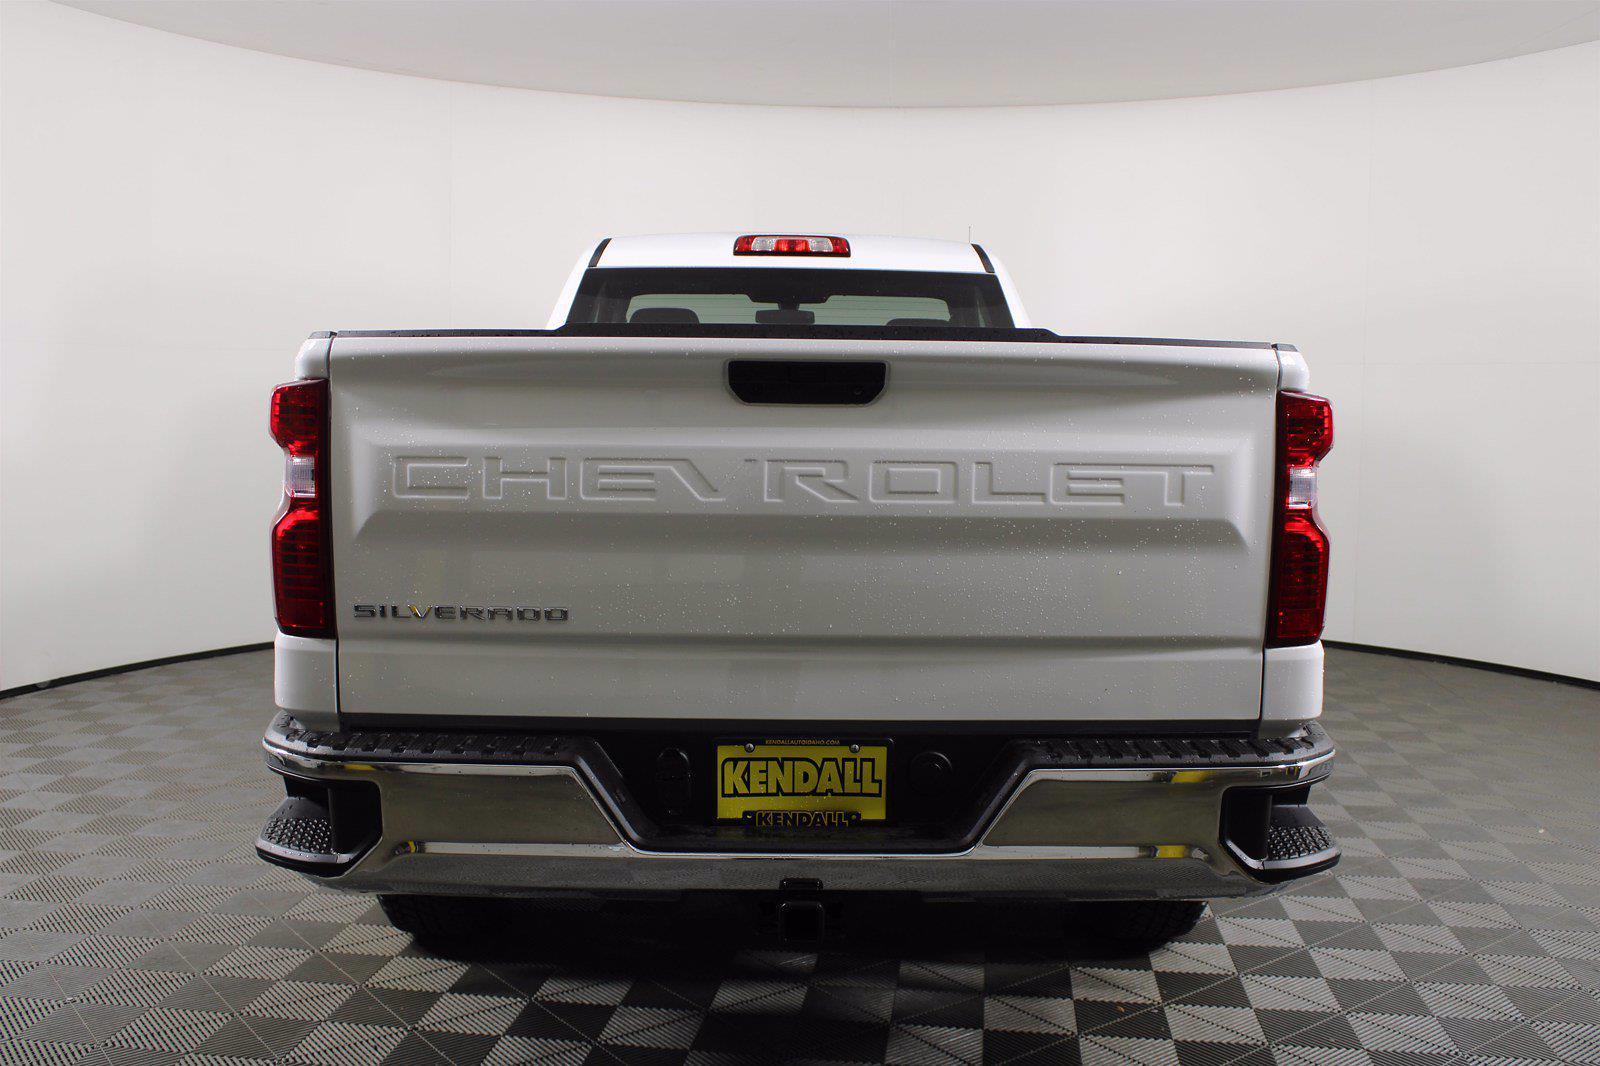 2021 Chevrolet Silverado 1500 Regular Cab 4x2, Pickup #D110918 - photo 8